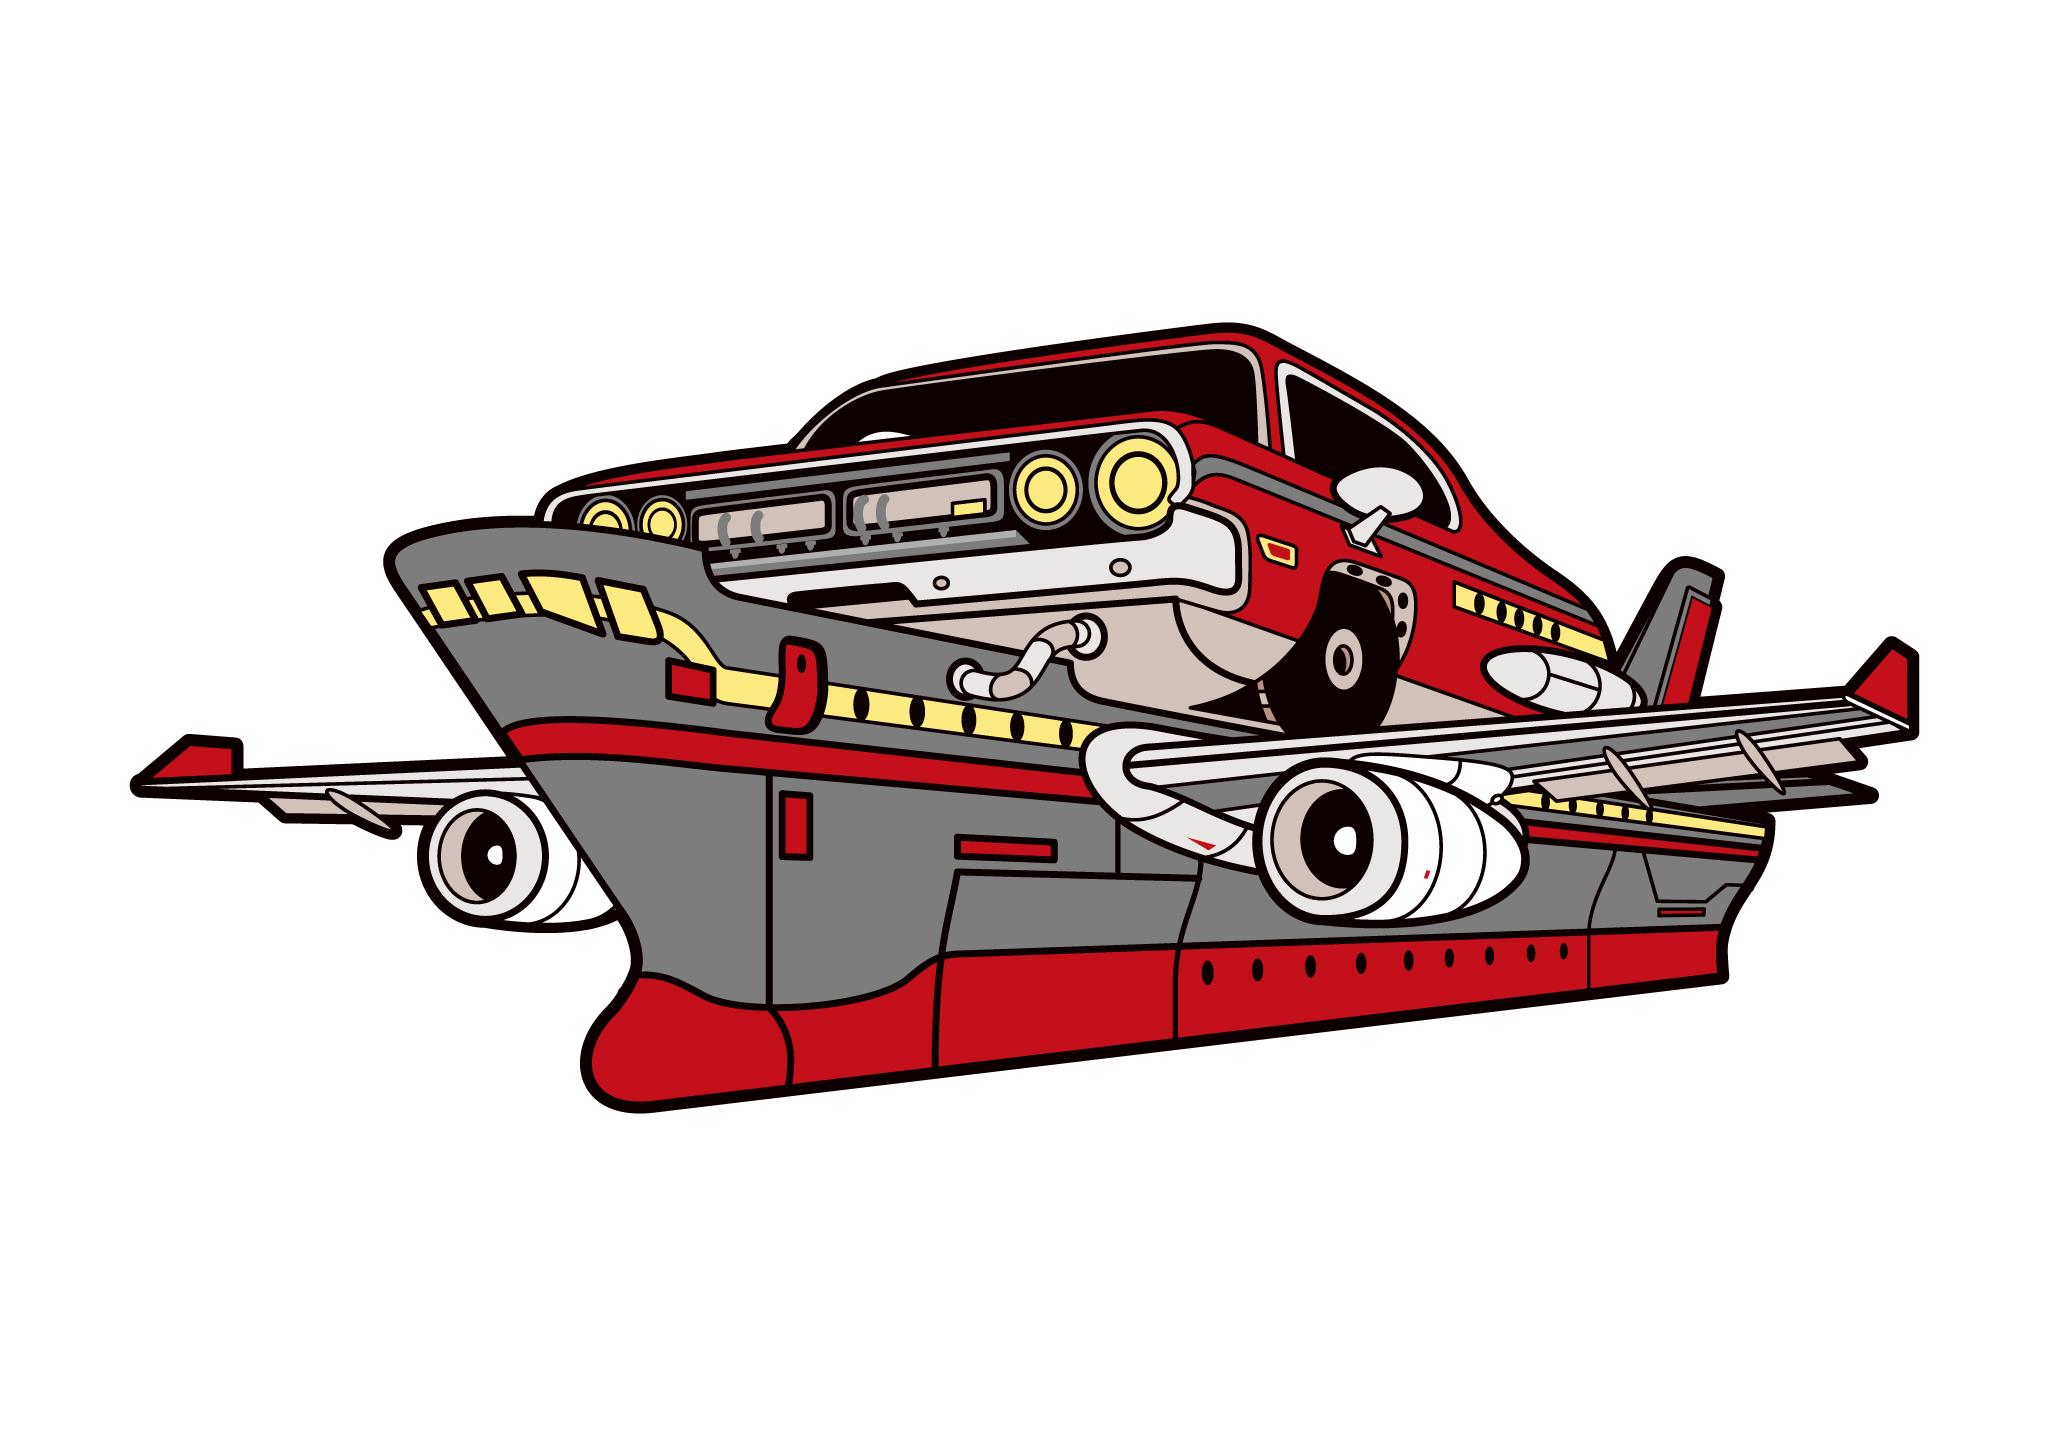 one_world_carplaneship.jpg